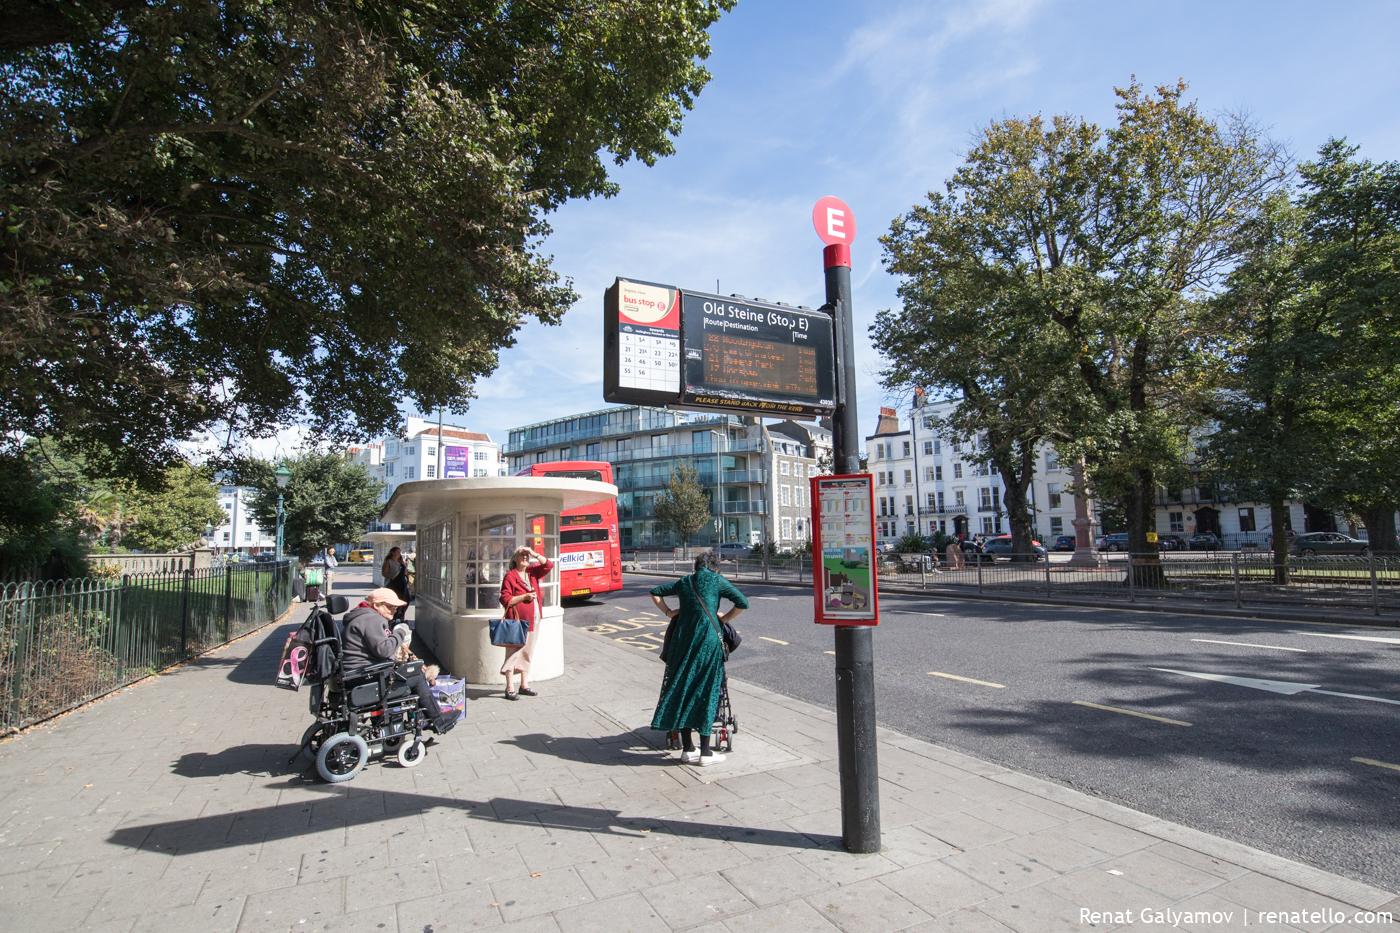 Informative bus station.